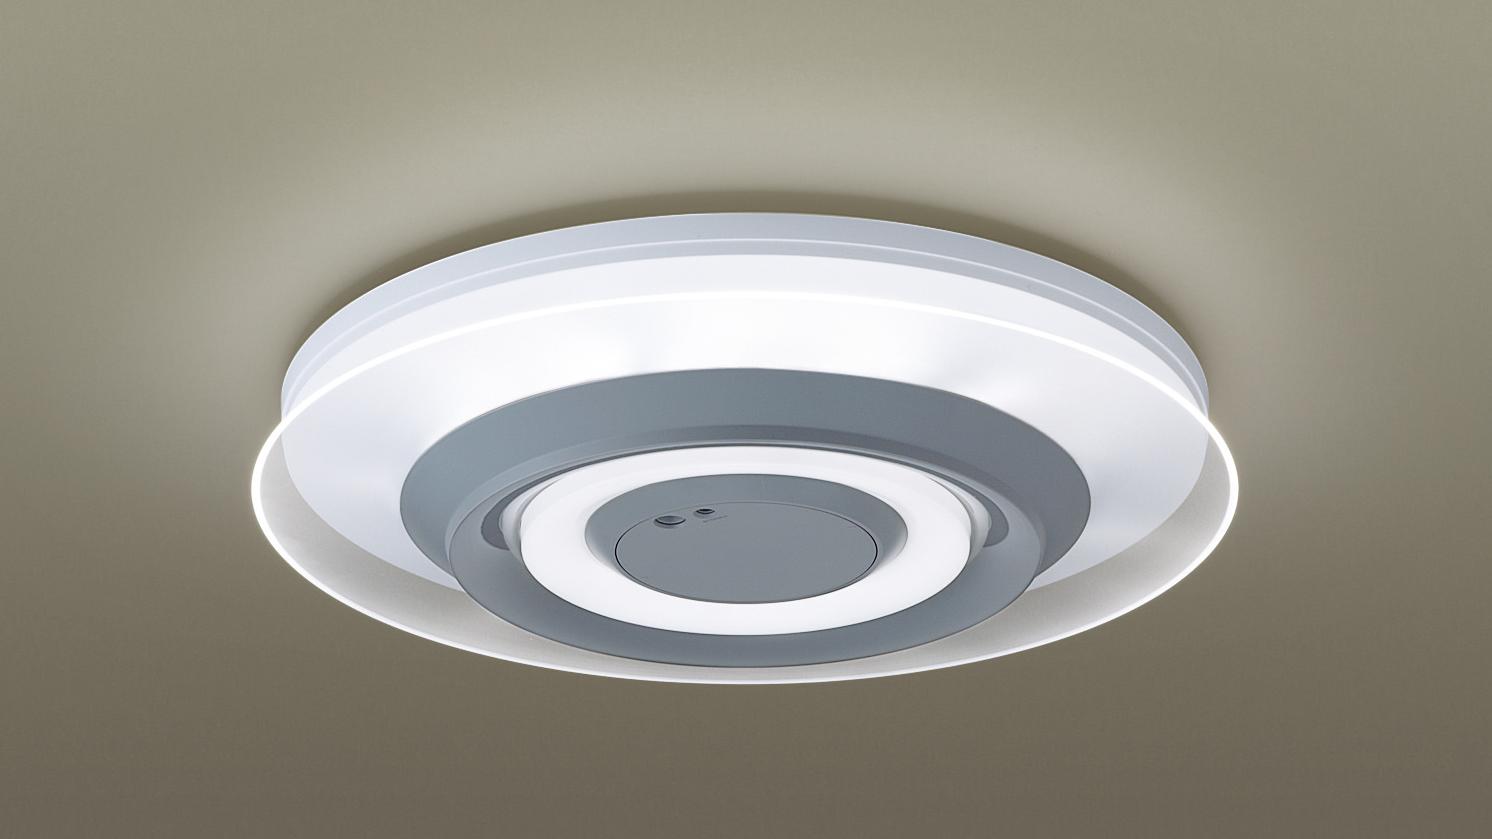 LEDシーリングライト 上下配光タイプ(導光クリアパネルデザイン)